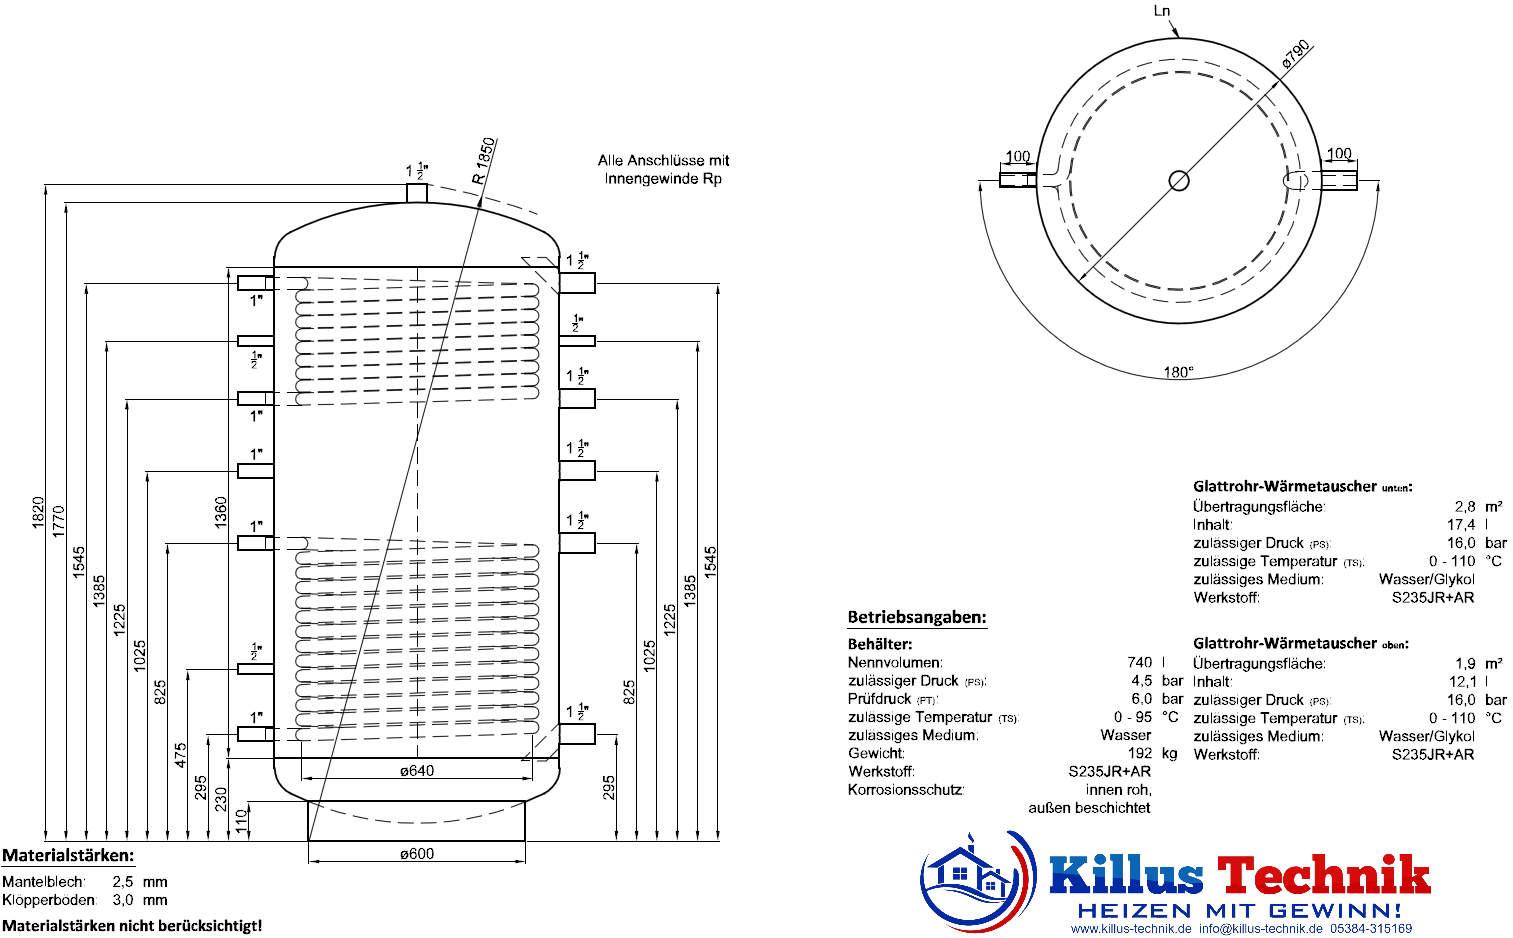 TWL Pufferspeicher 800 Liter 2 Wärmetascher Killus-Technik.de